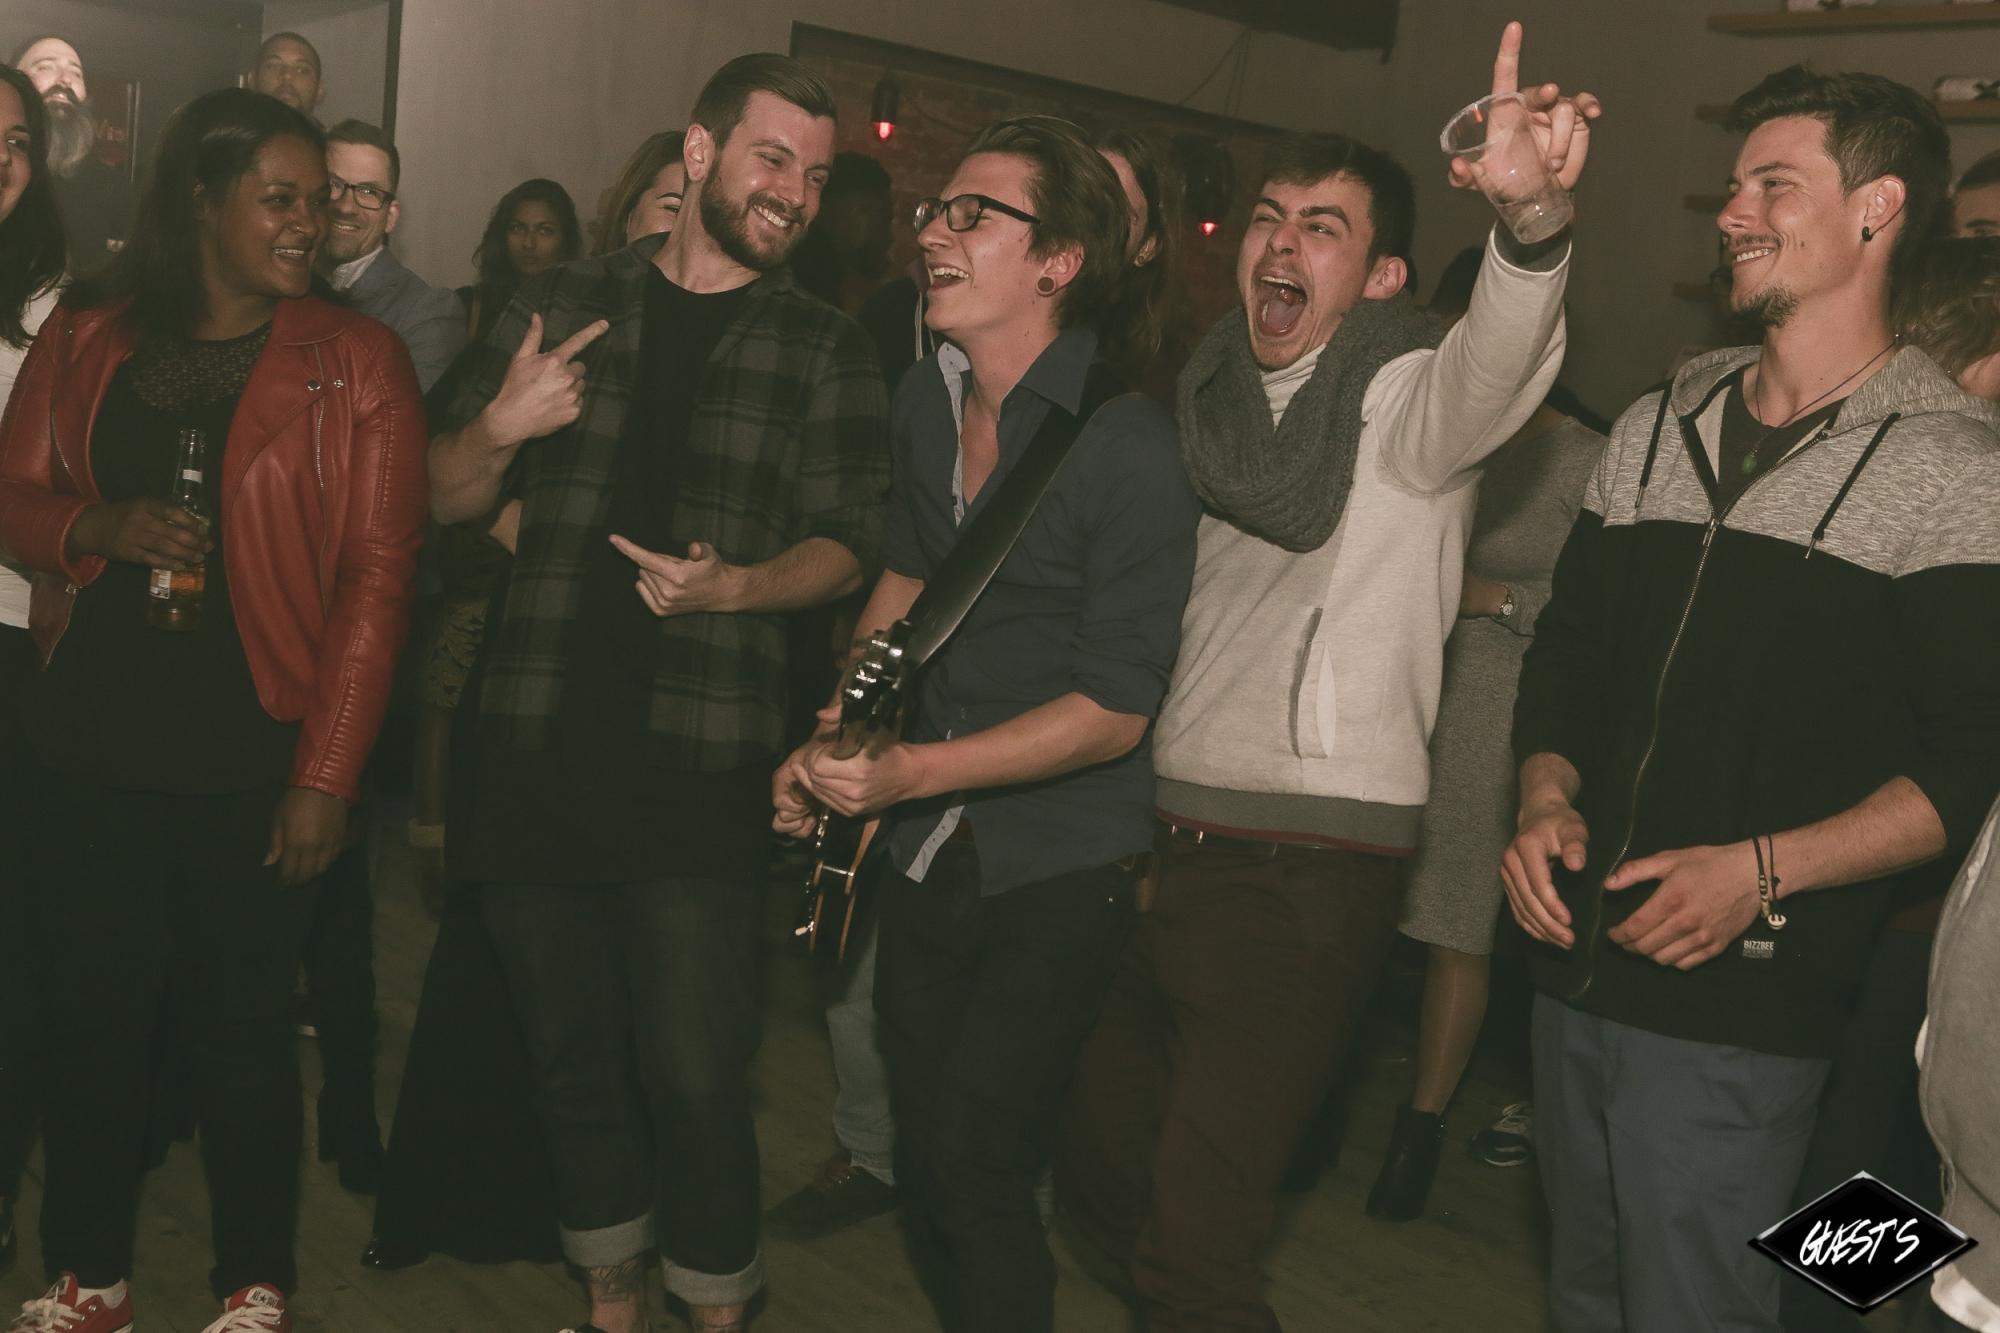 Quizz Musical Live Band - Mercredi 26 Avril 2017 - 02